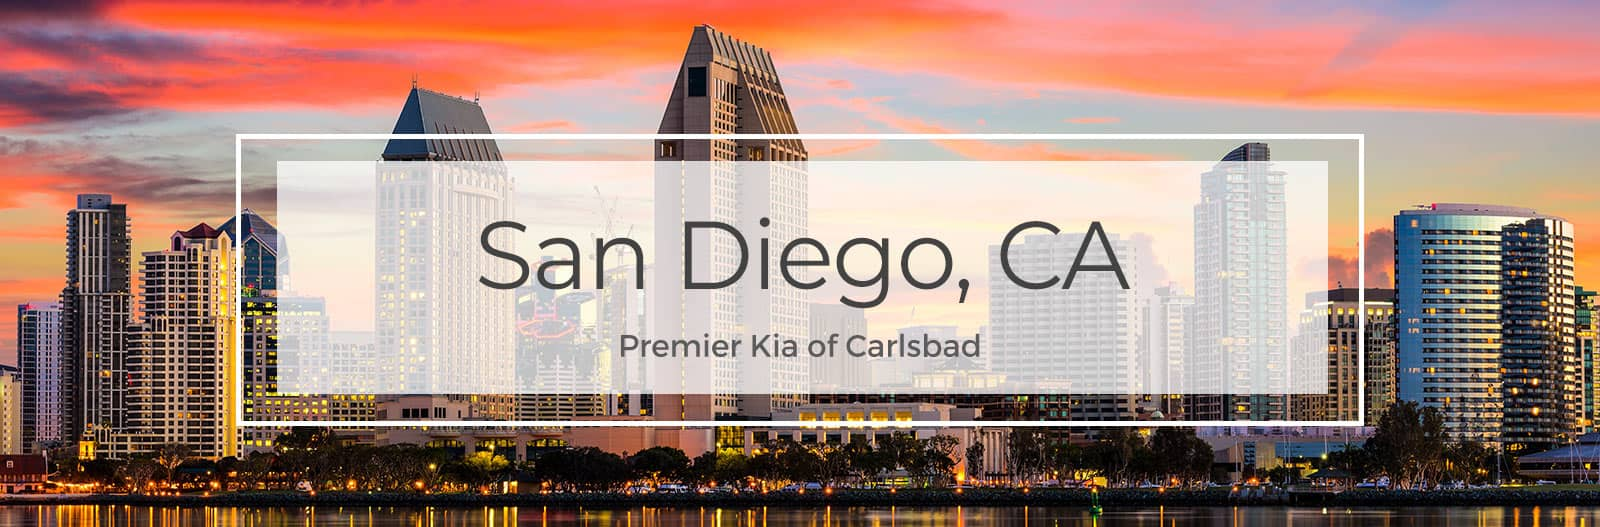 Premier KIA Carlsbad Serving San Diego, CA